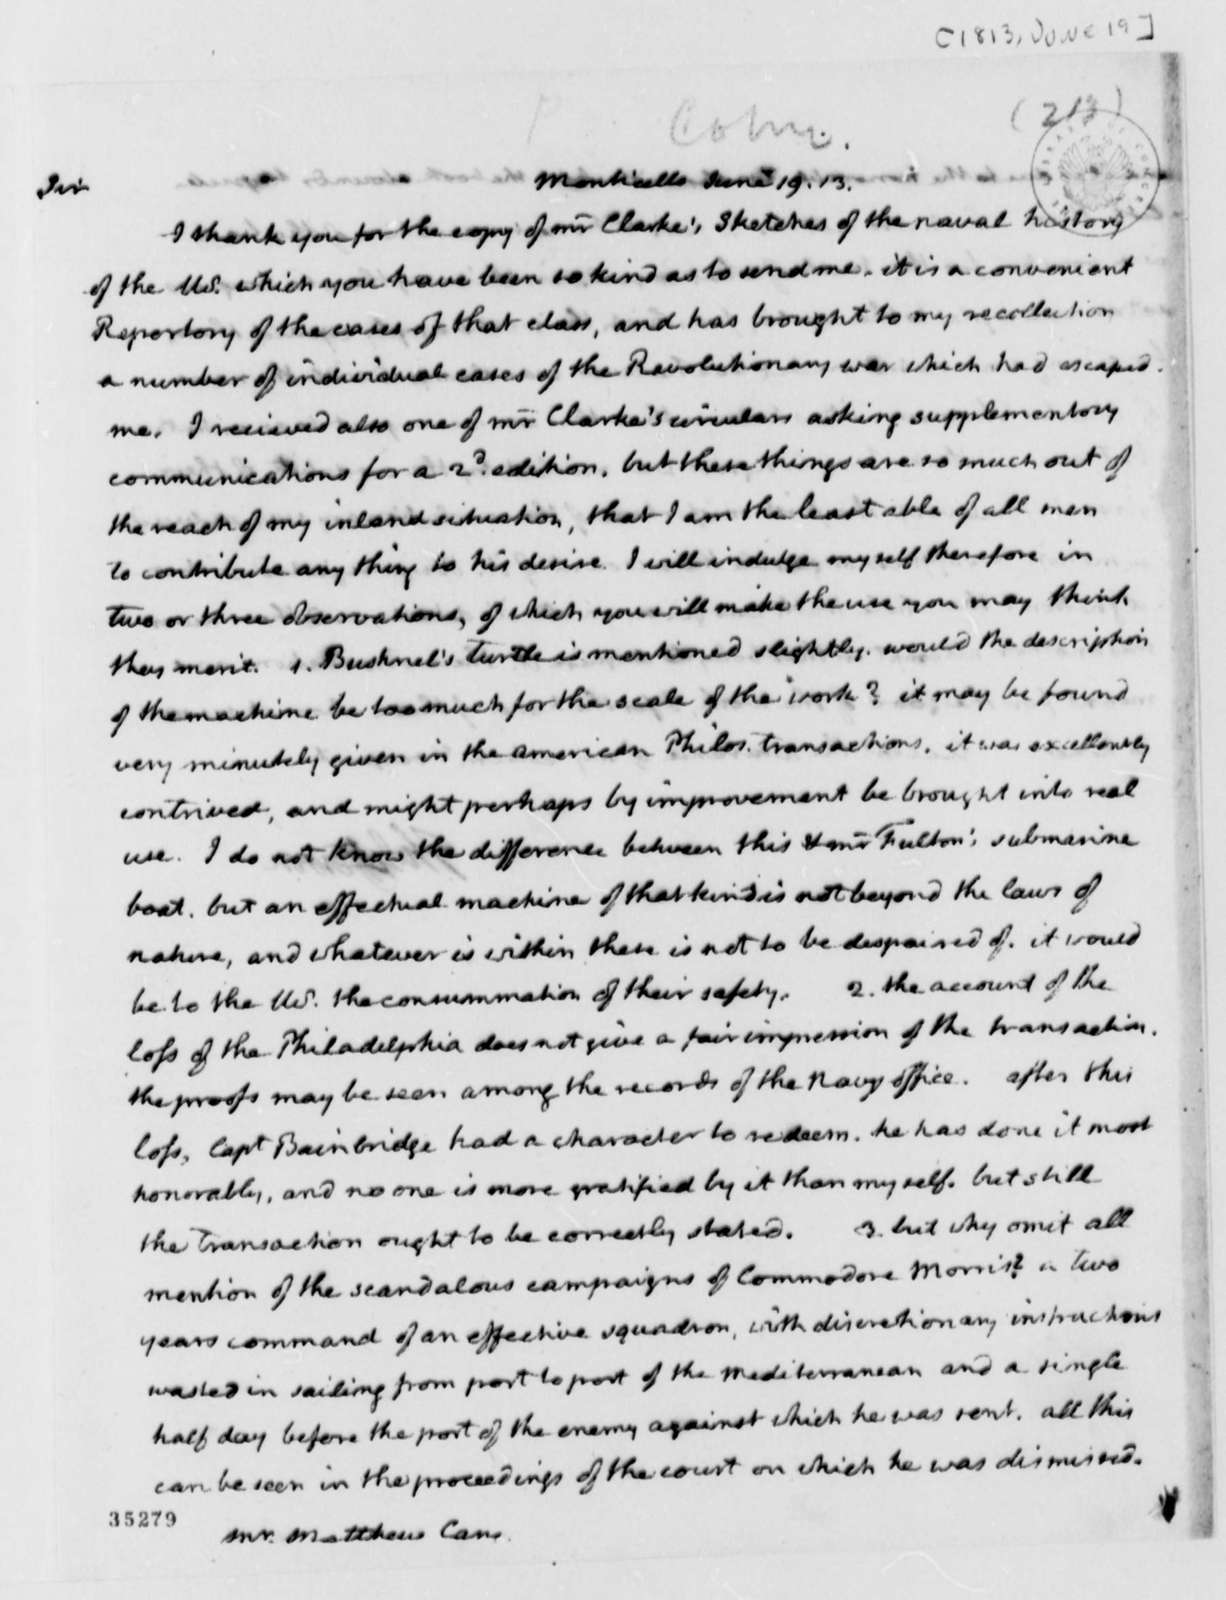 Thomas Jefferson to Matthew Carey, June 19, 1813